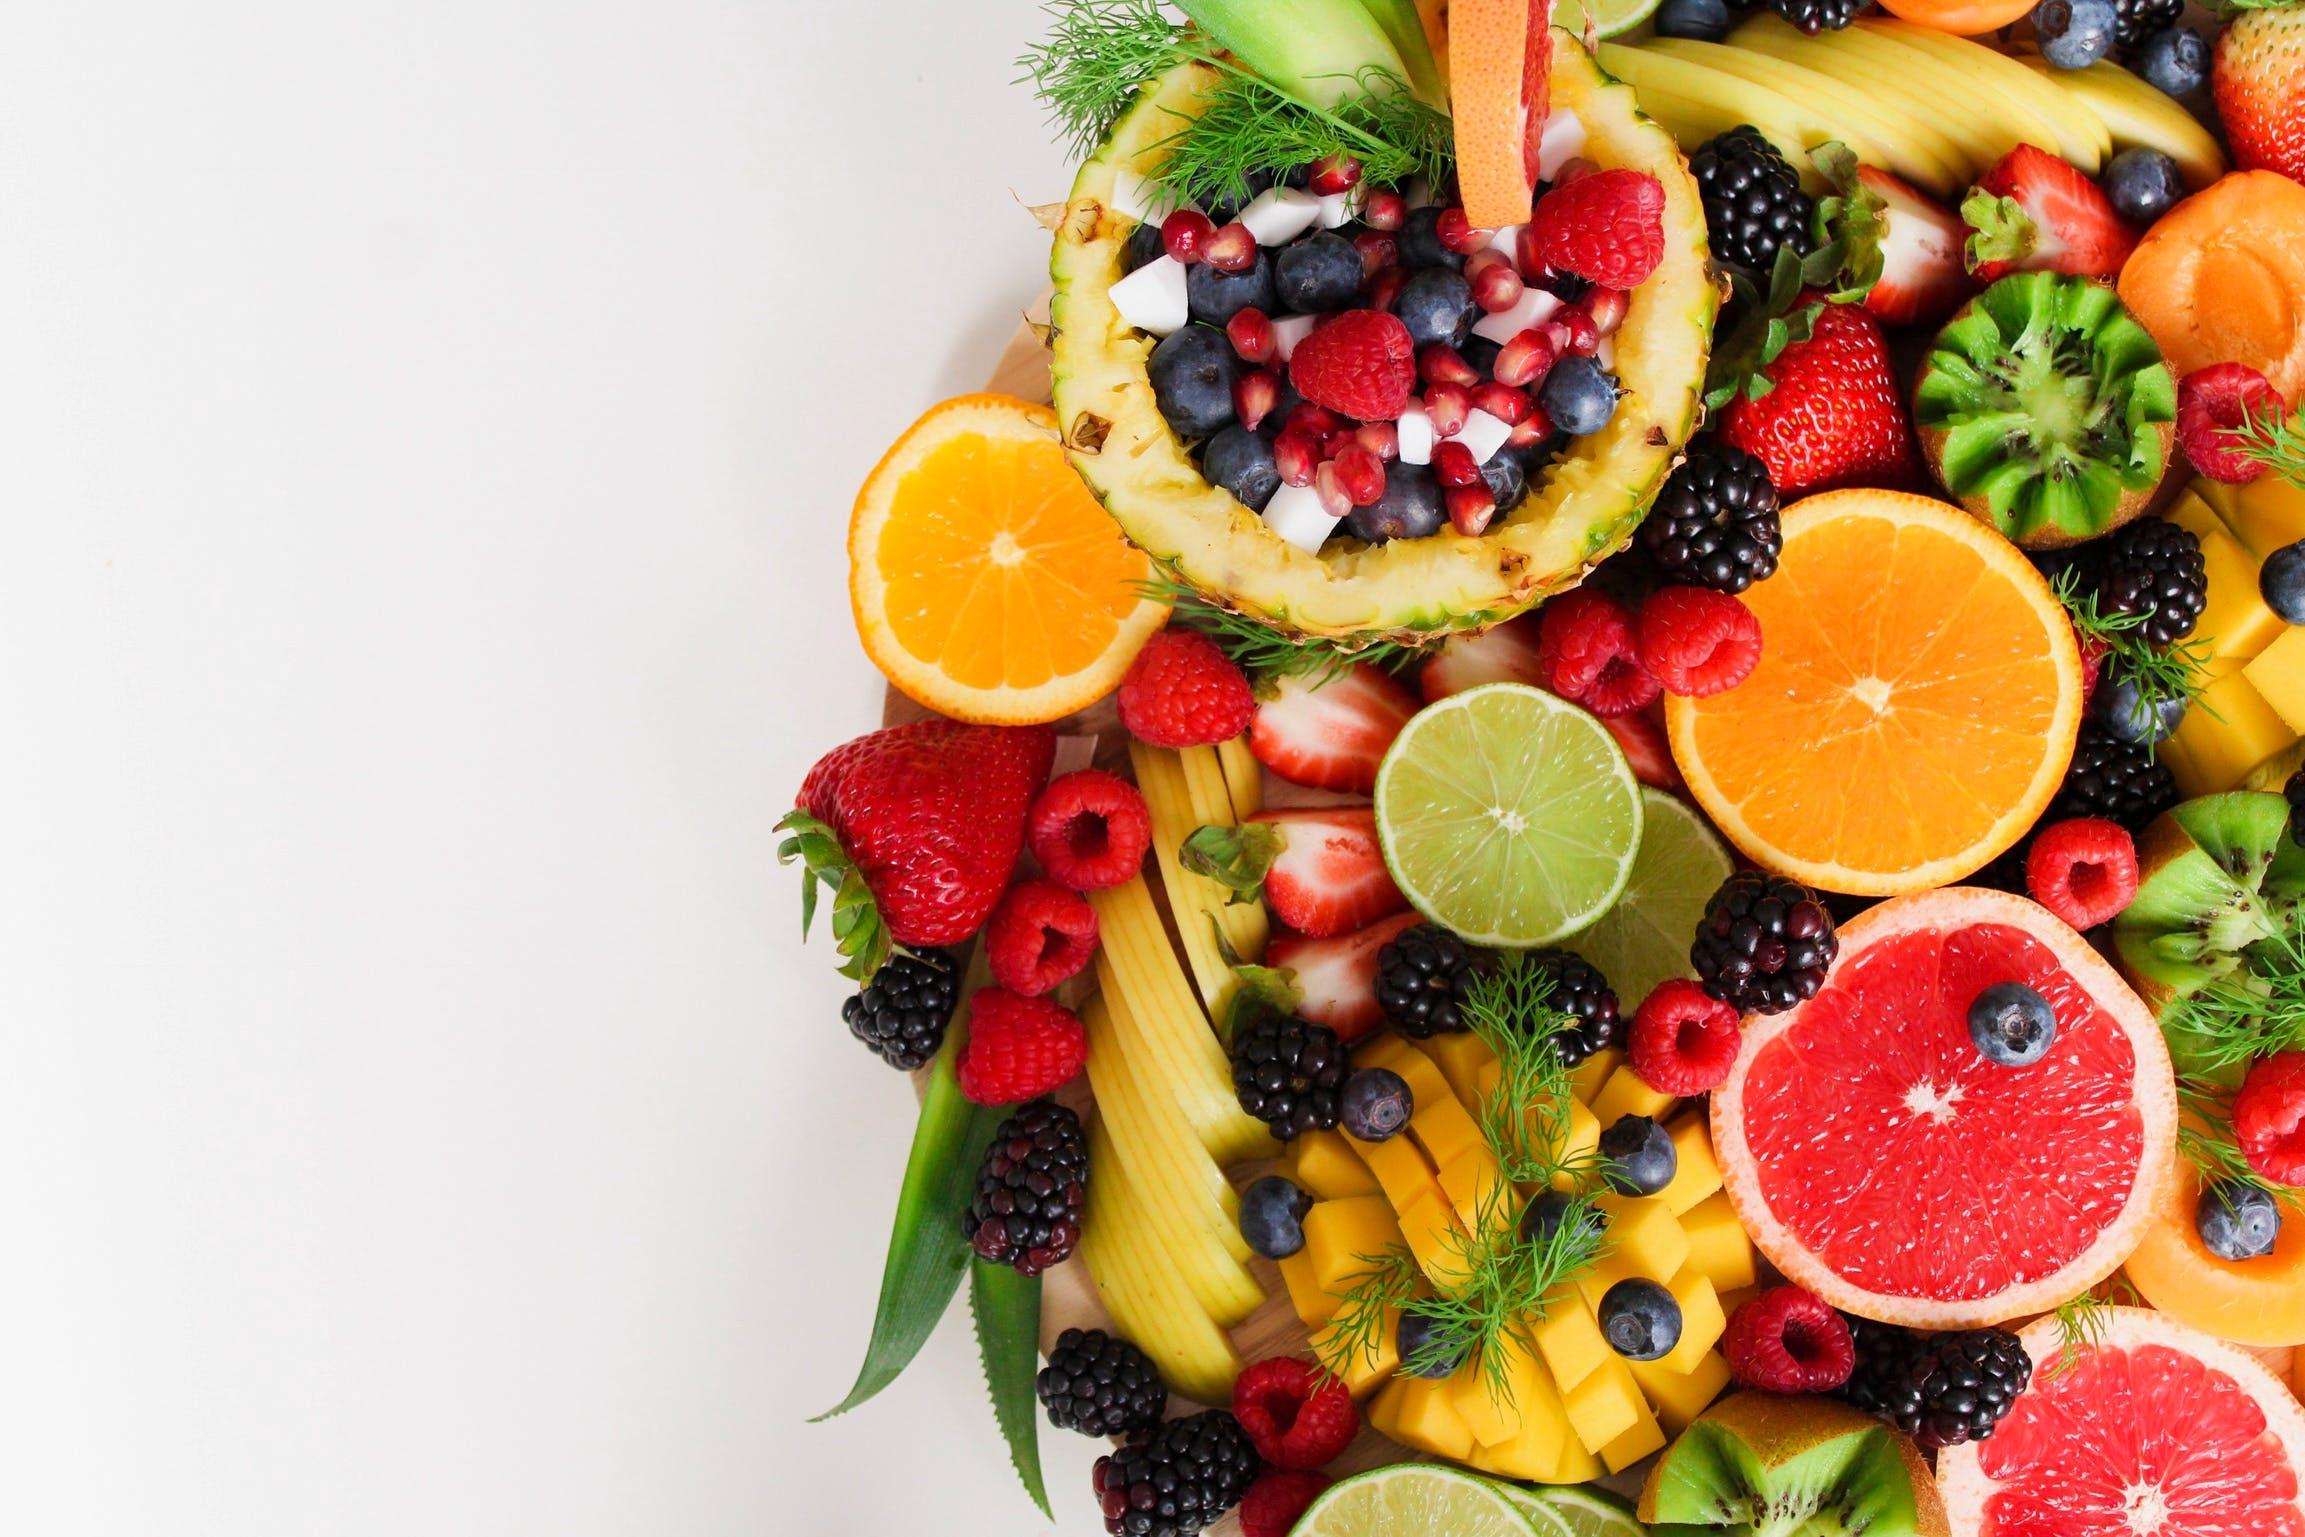 Fotos de stock gratuitas de bol de fruta, cesta de frutas, cítricos, colorido